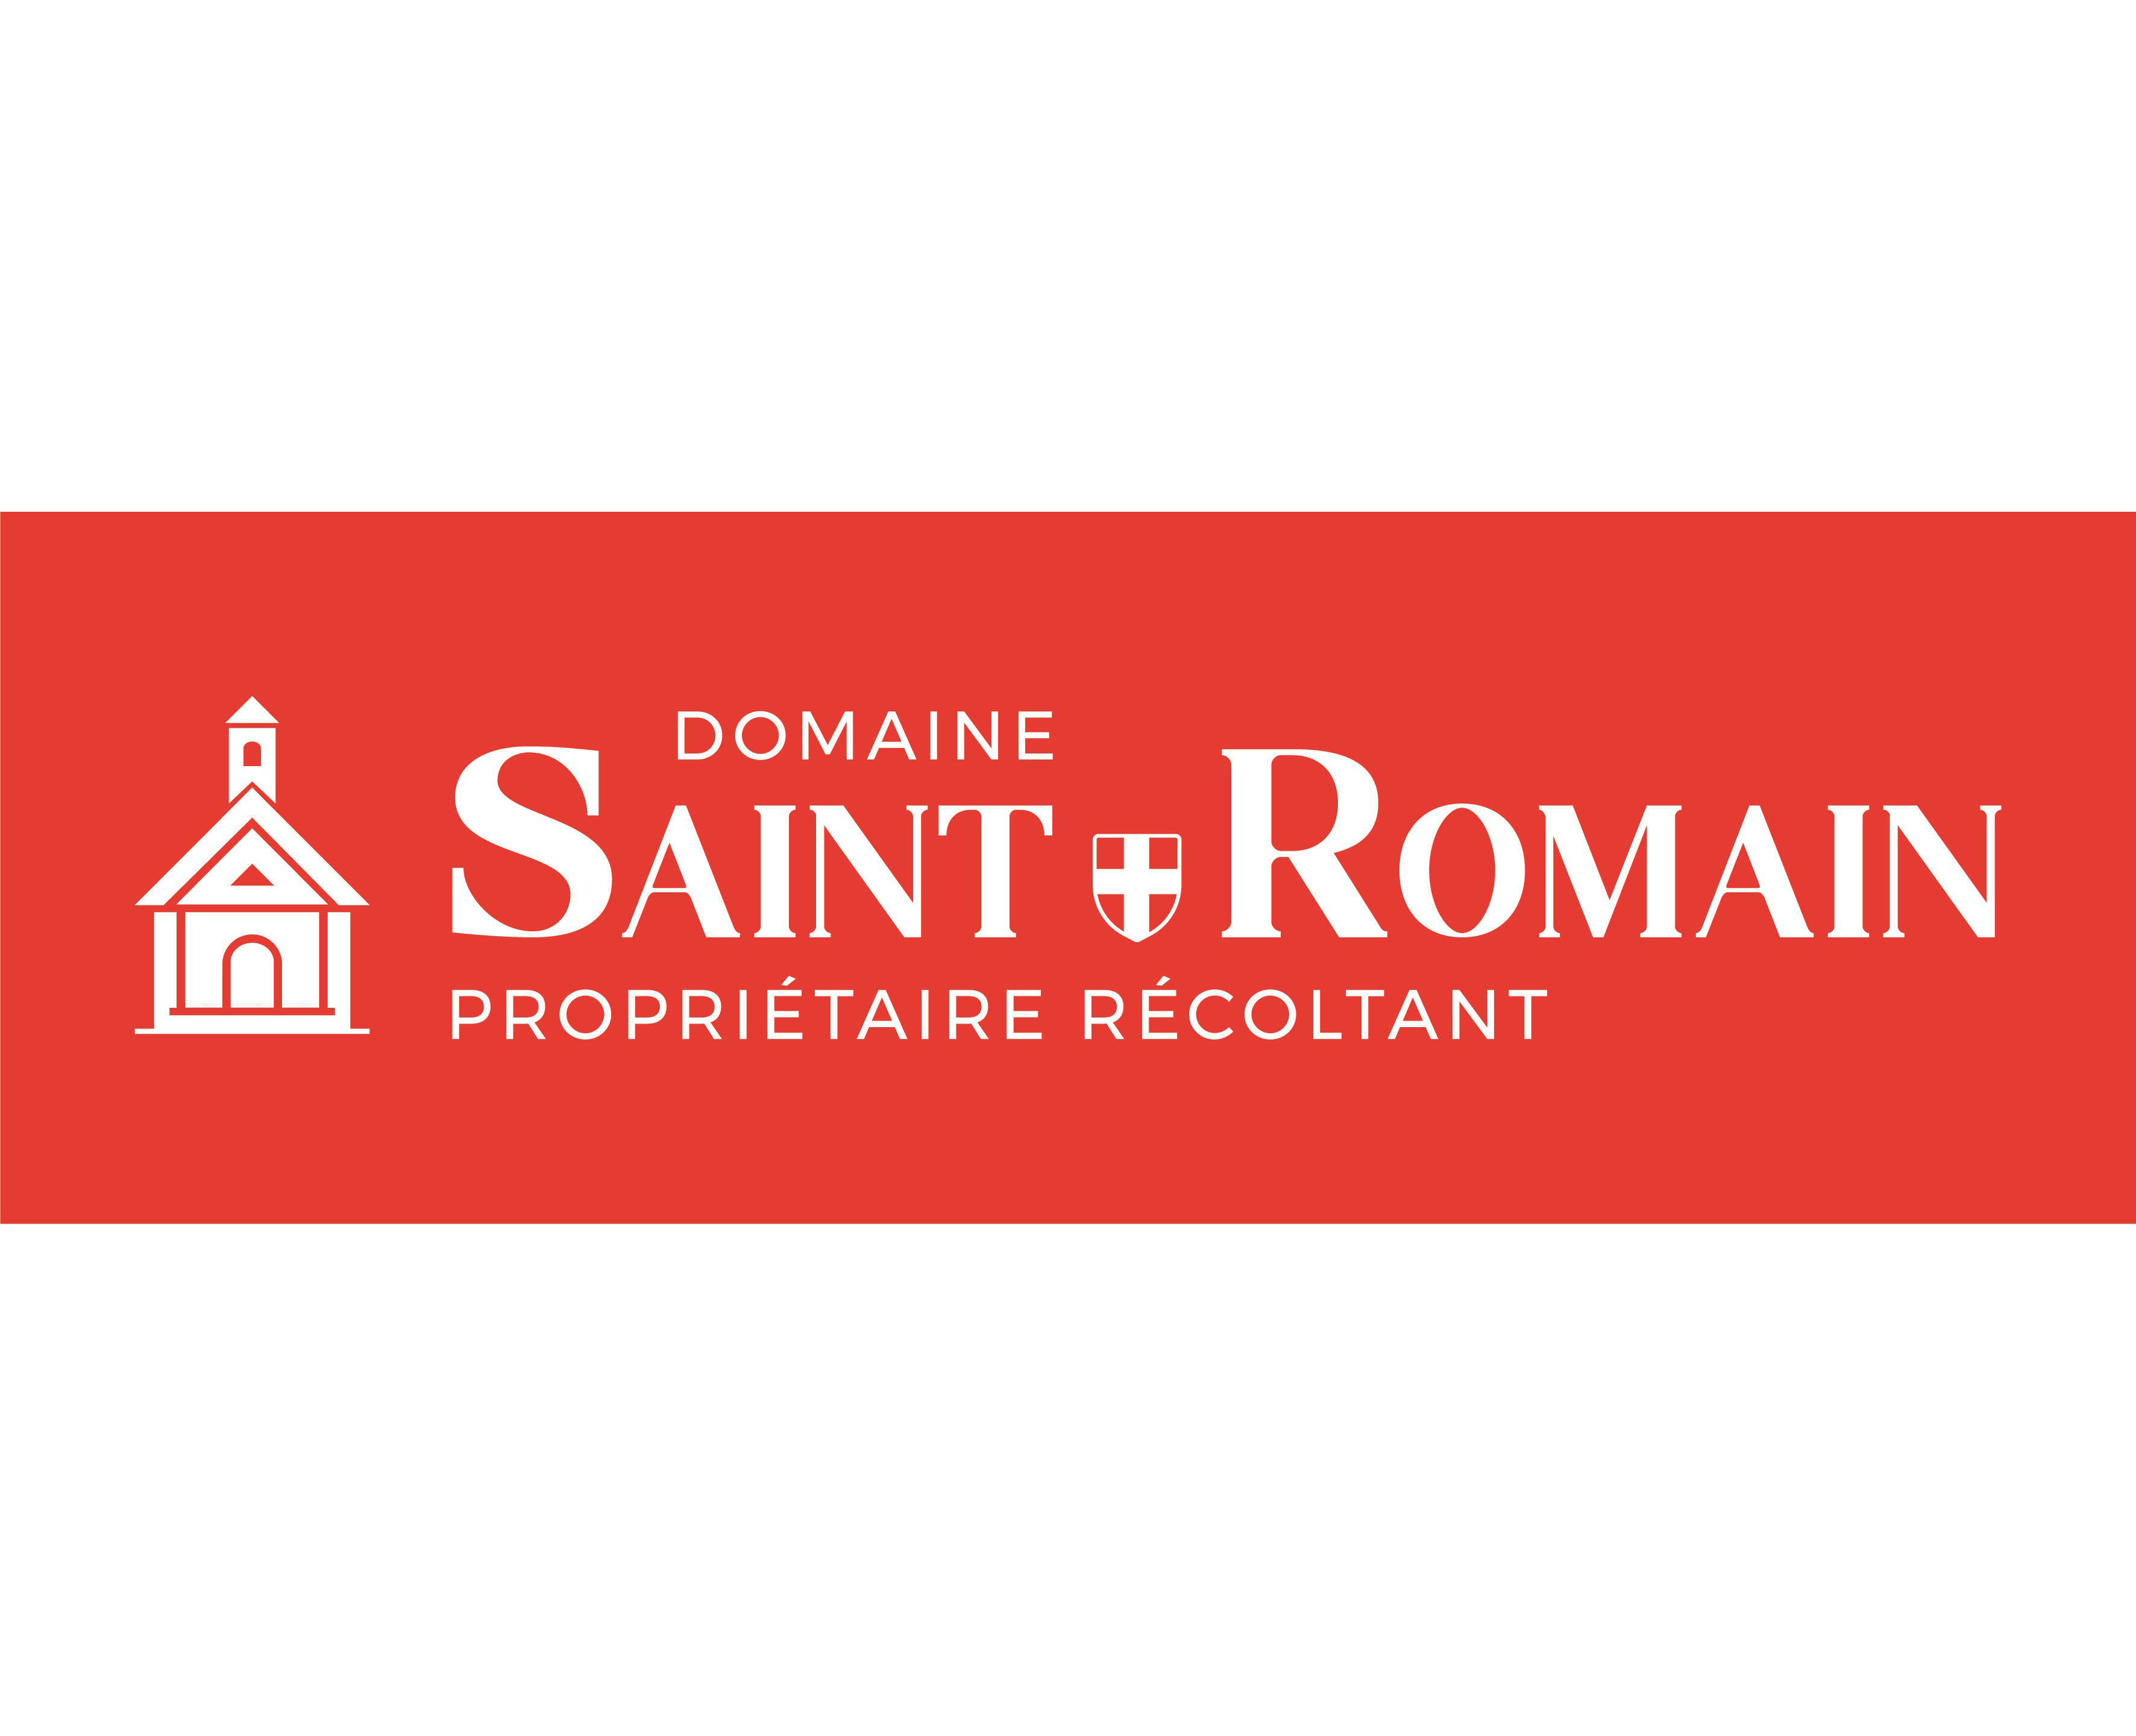 DOMAINE SAINT-ROMAIN